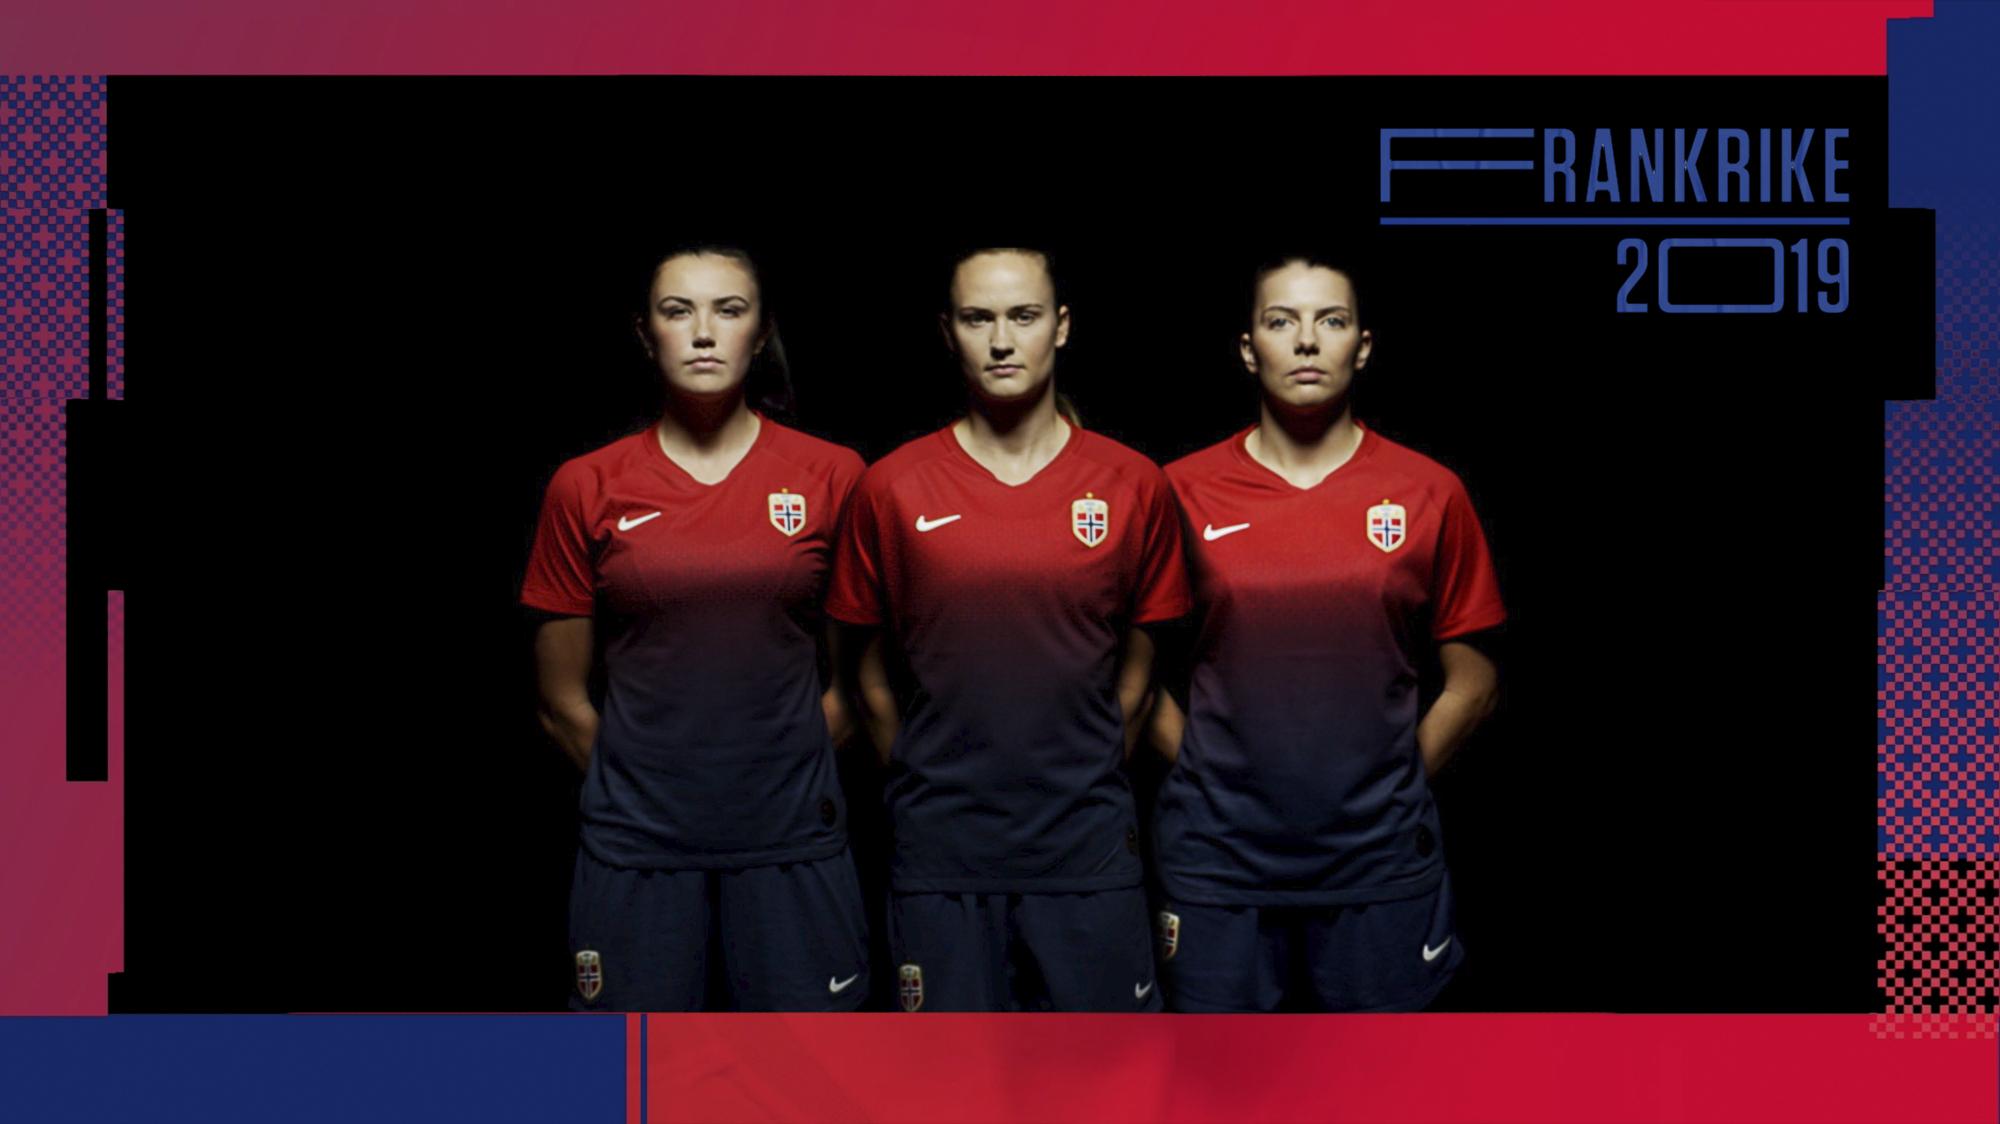 Nike_thumbnail.jpg